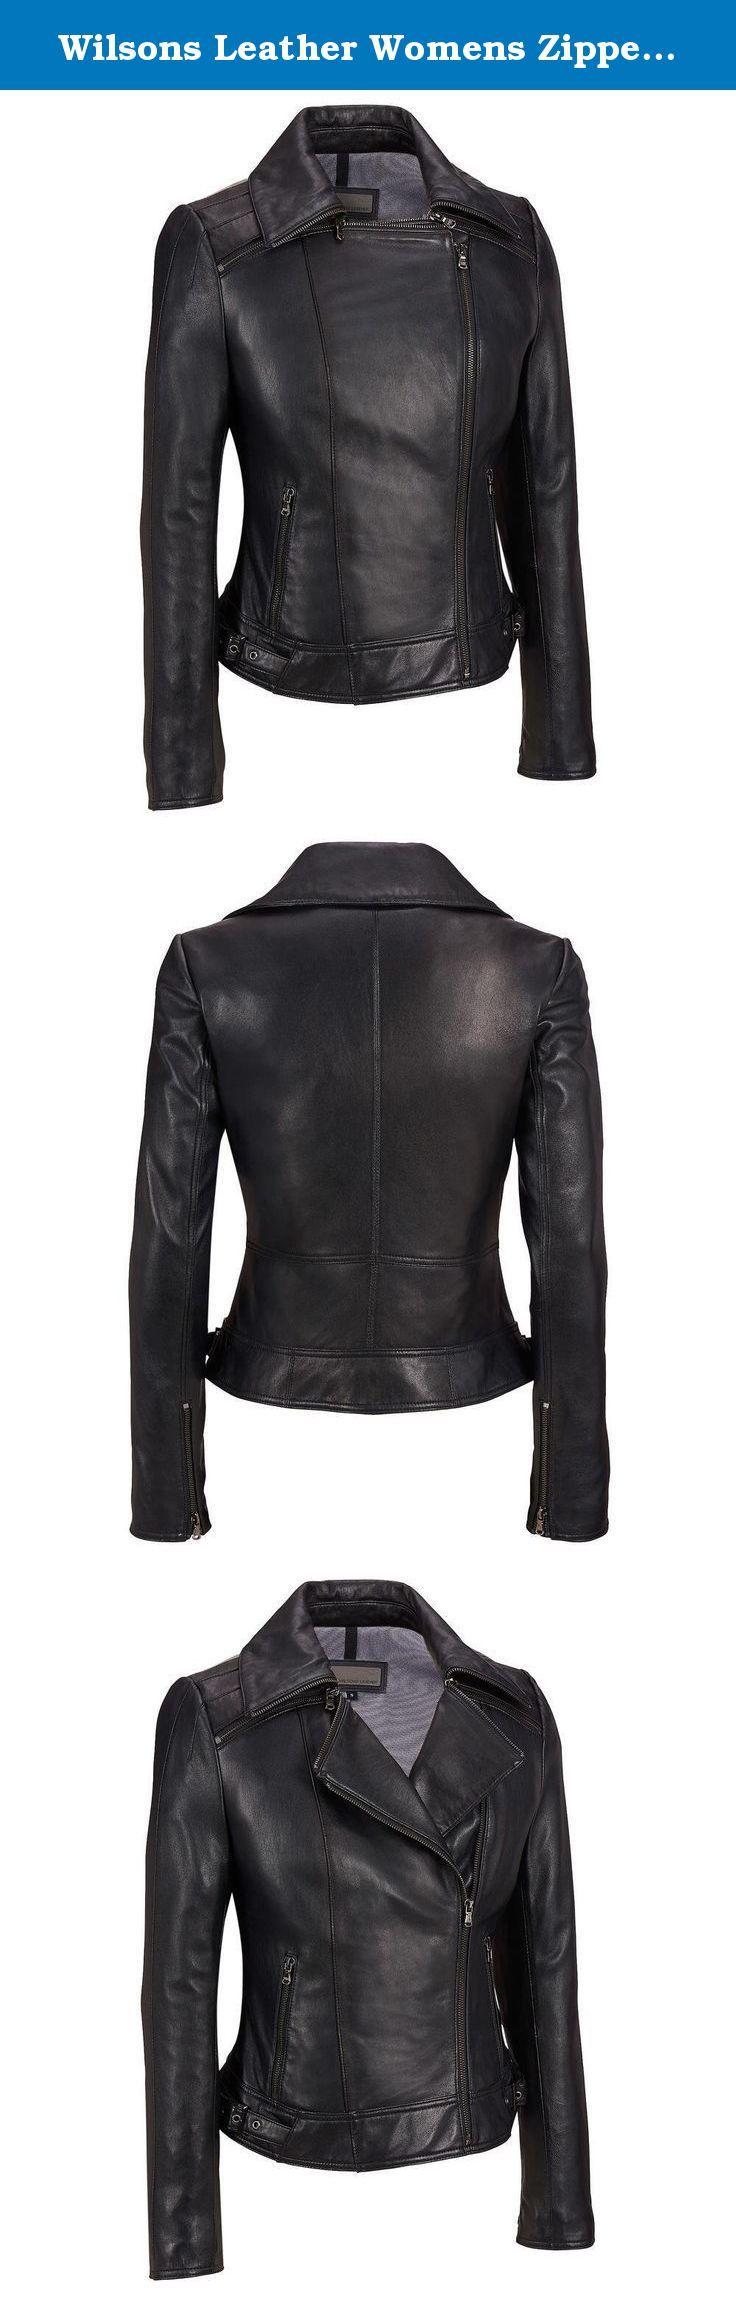 Wilsons Leather Womens Zipper Collar Asymmetric Leather